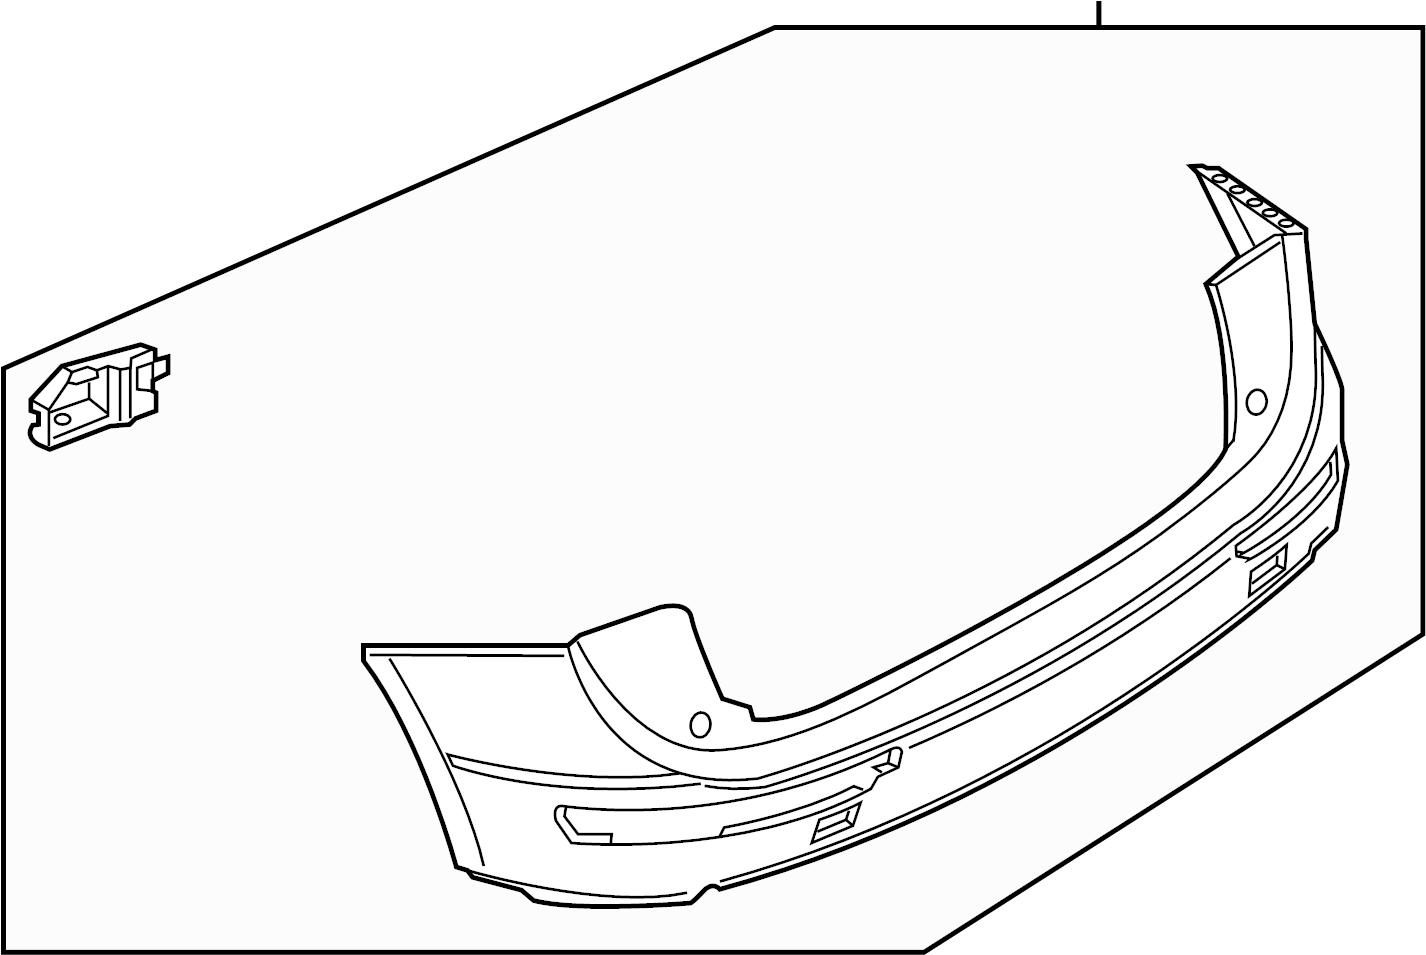 Audi Q5 Bumper Cover Cover Assembly W O S Line Pkg